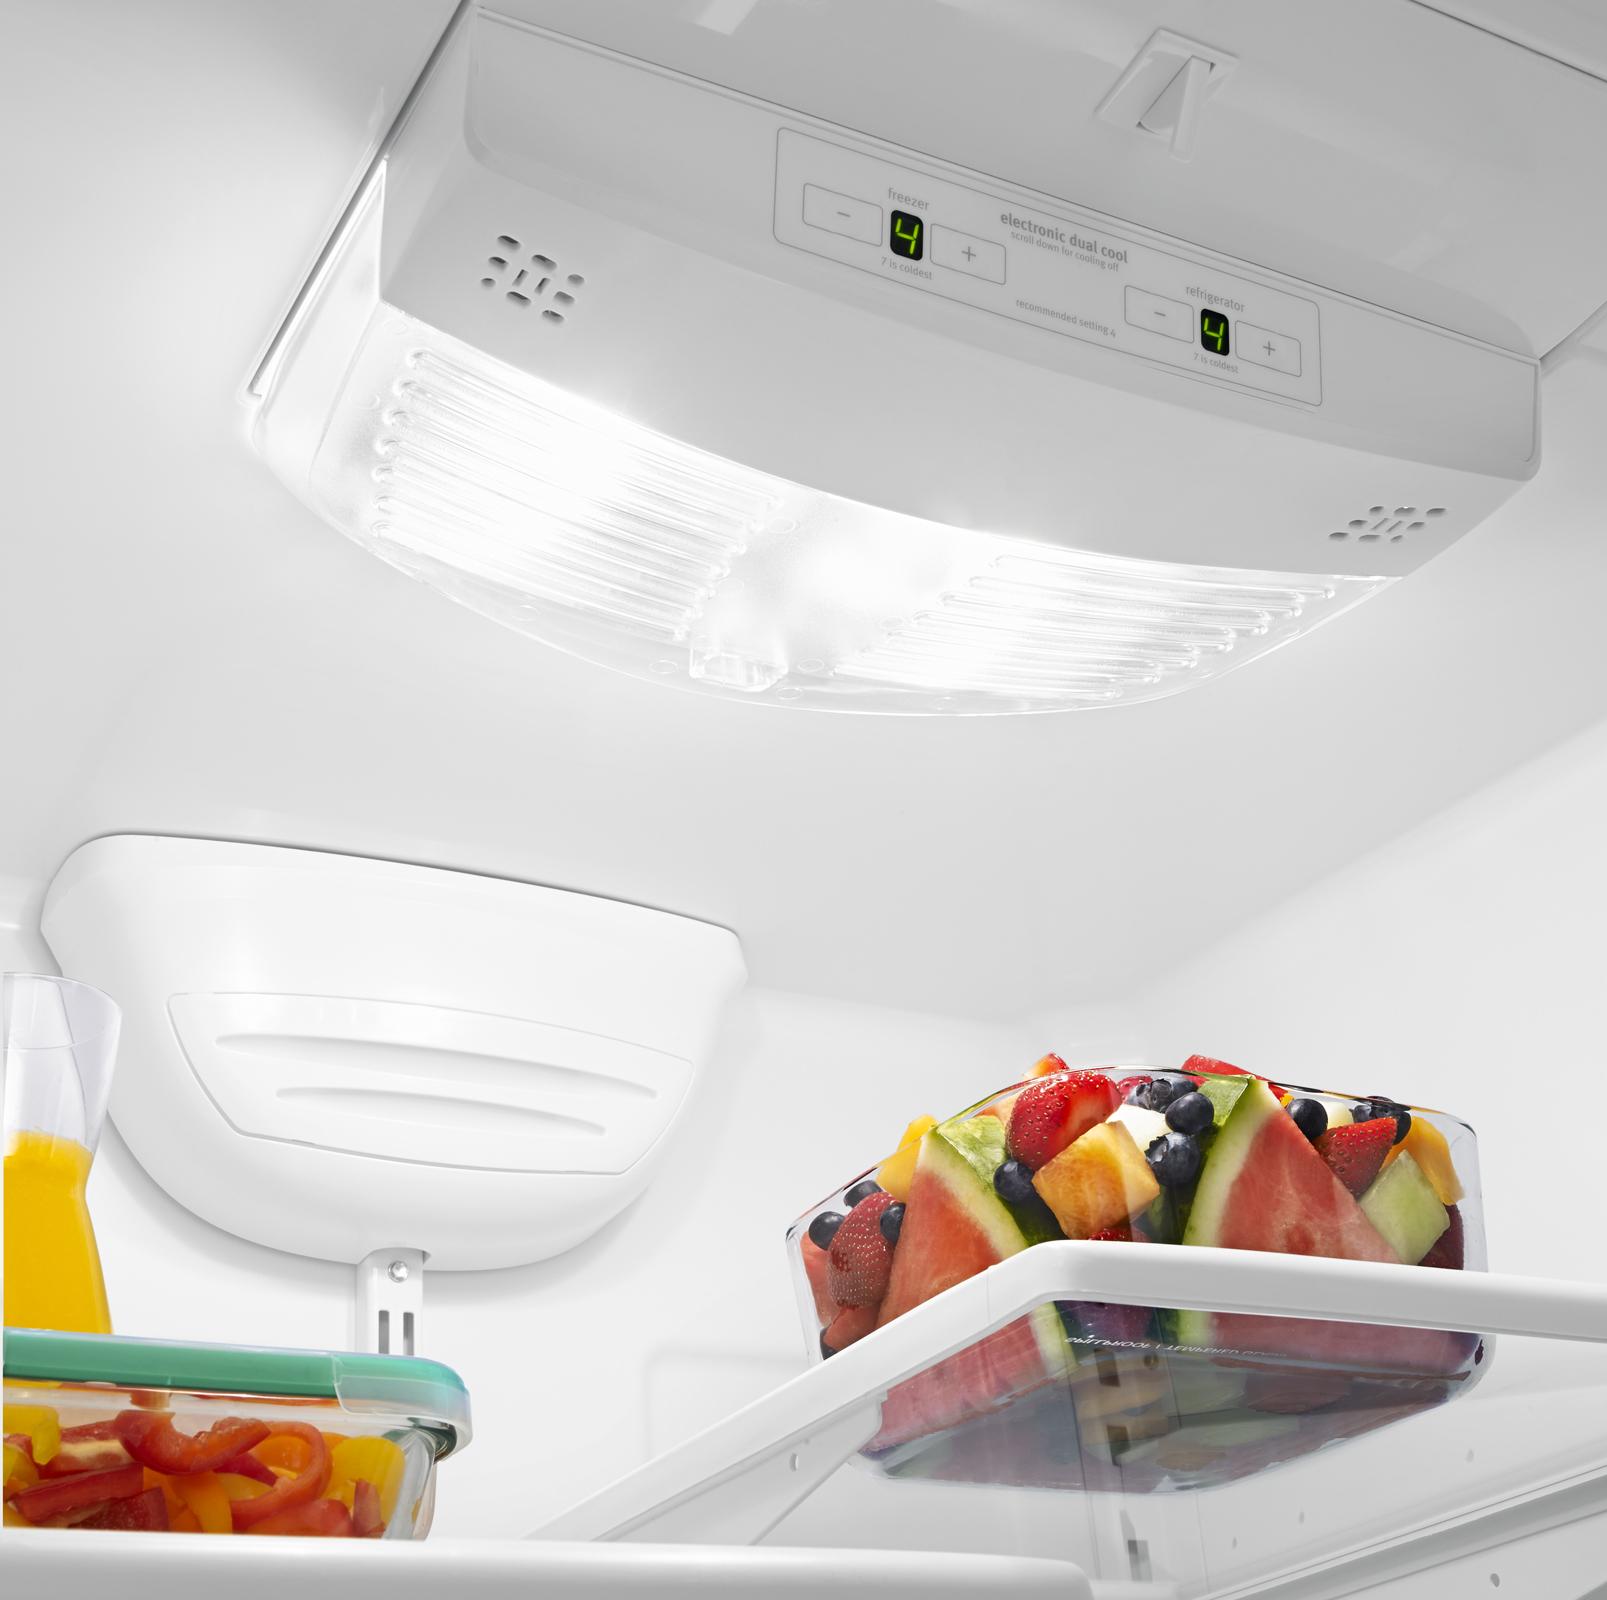 Whirlpool WRB119WFBB 19 cu. ft. Single Door Bottom Freezer Refrigerator w/ Adaptive Defrost - Black